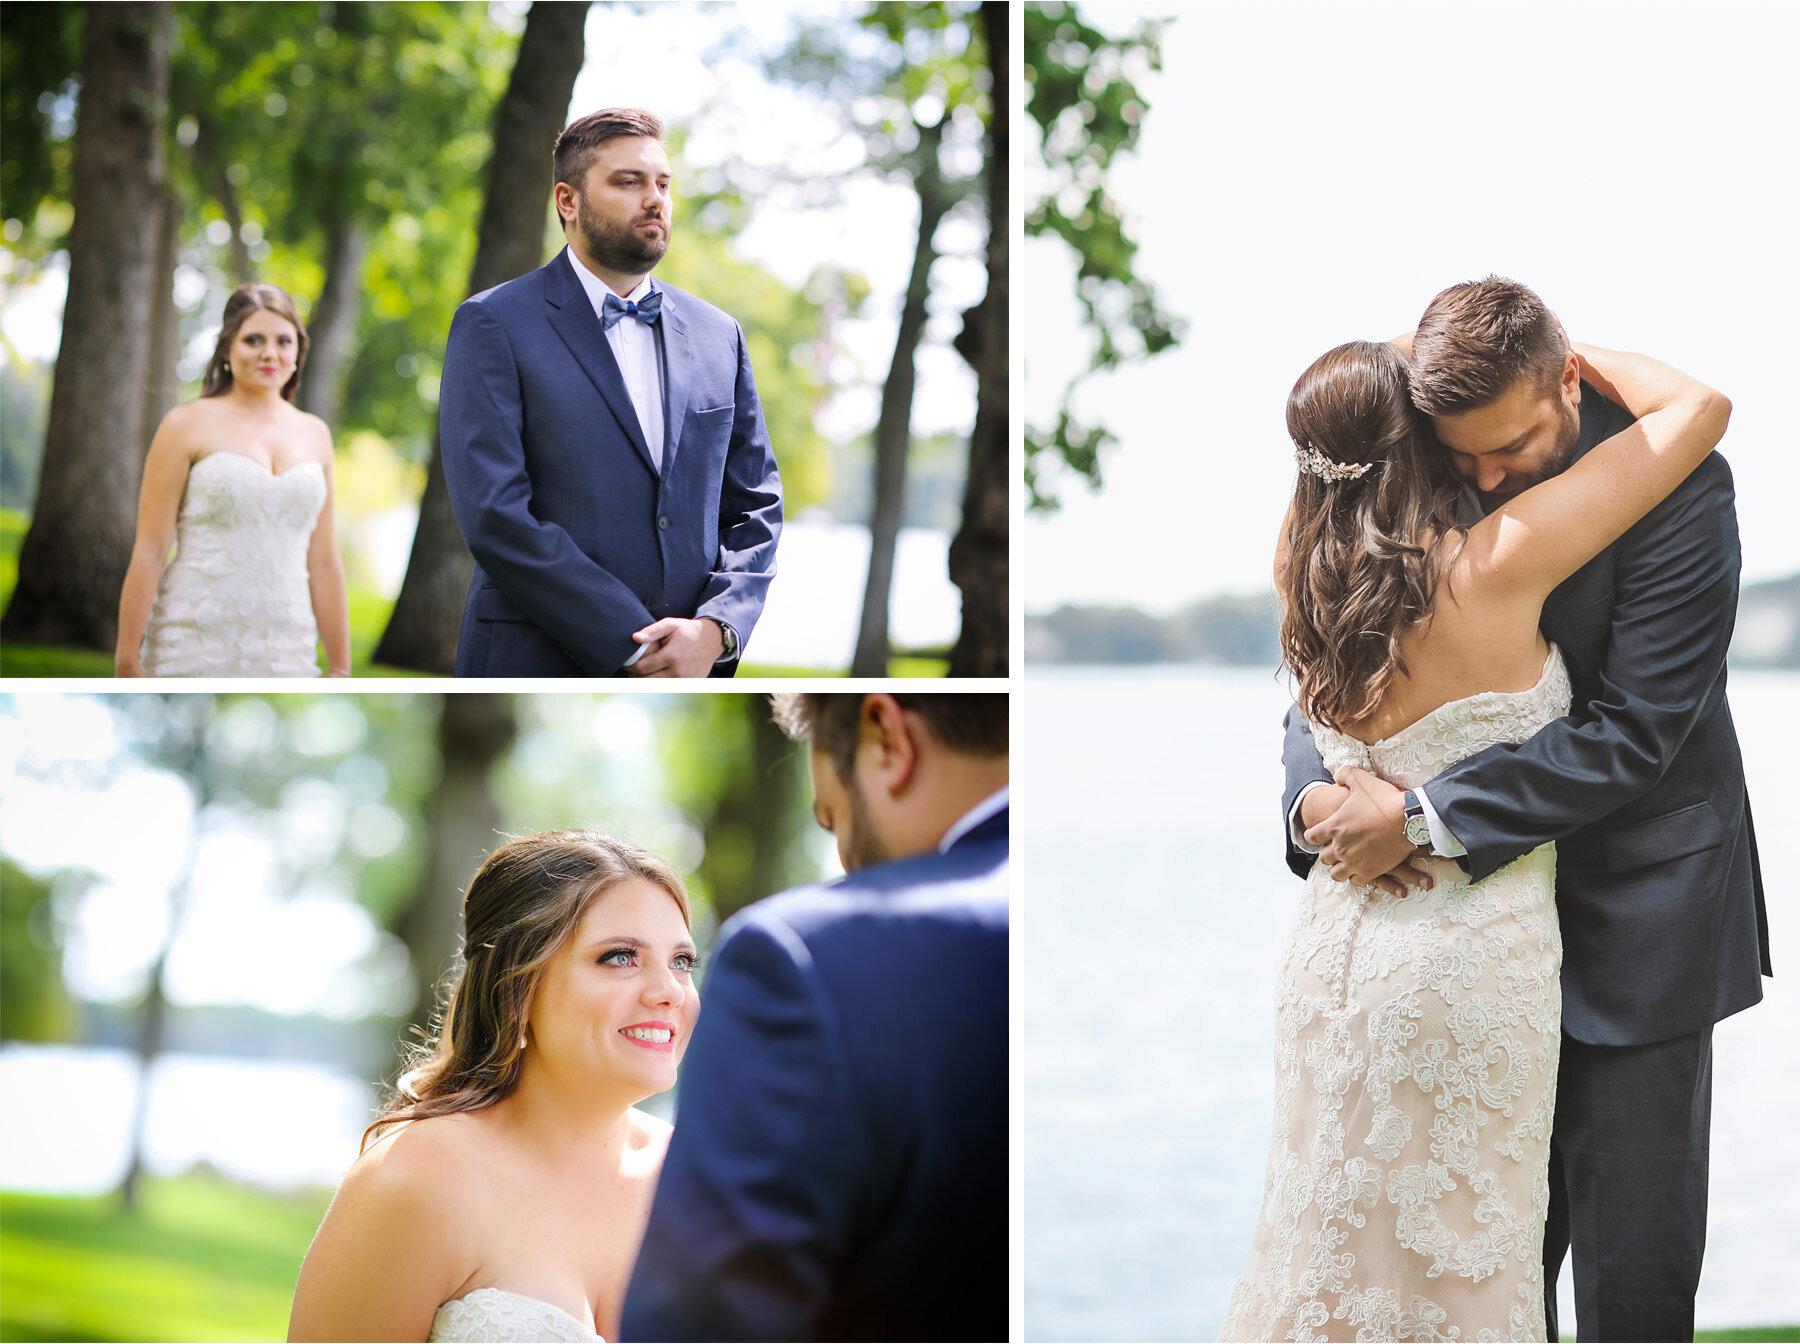 06-Vick-Photography-Wedding-Minnetonka-Minnesota-Family-Home-Bride-Groom-First-Look-Lake-Katie-and-David.jpg